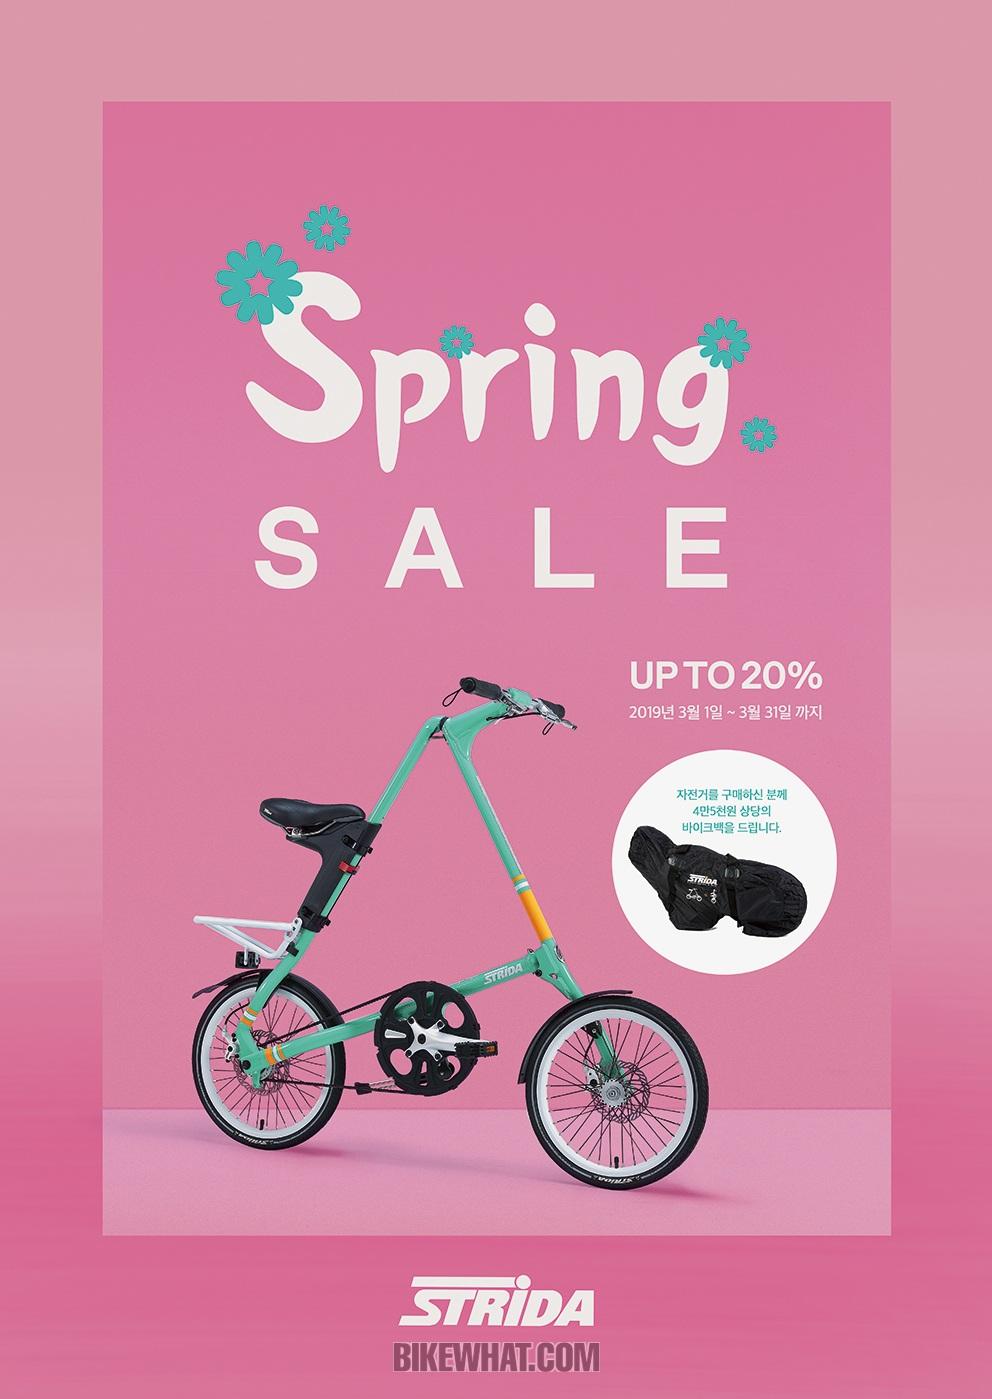 2019_spring sale_strida.jpg